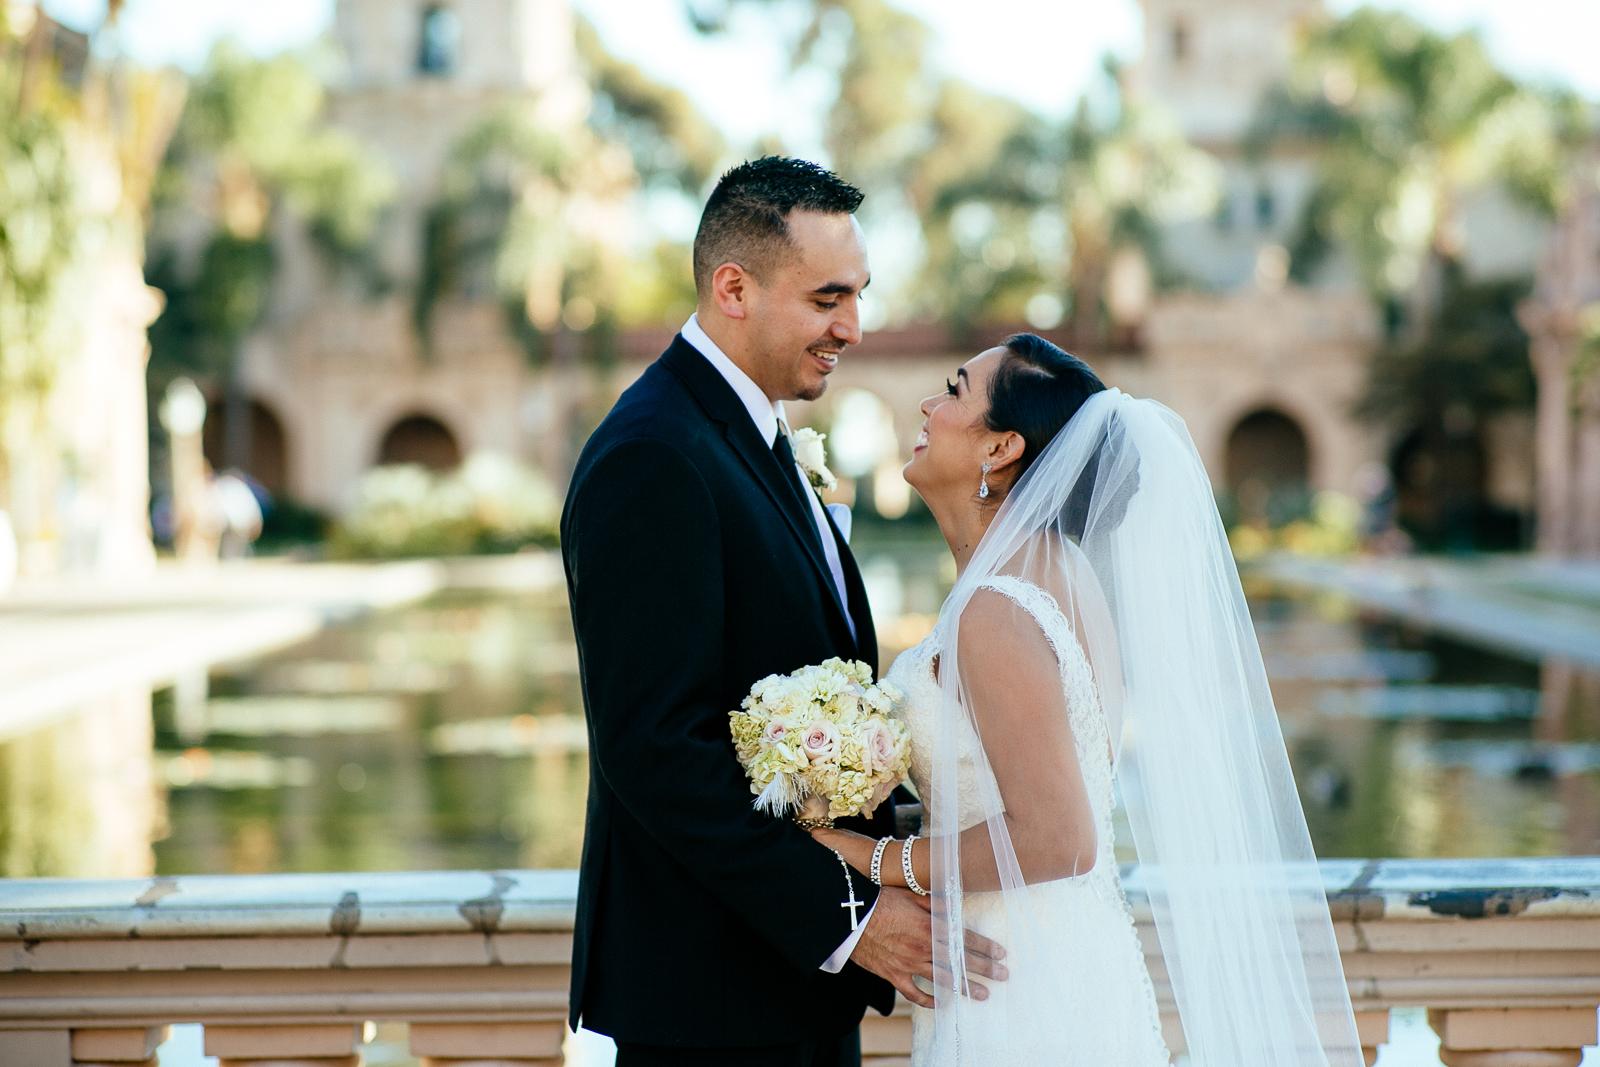 ANGELINE_&_JESUS_WEDDING_LAFAYETTE_HOTEL_2015_2015_IMG_3310.JPG